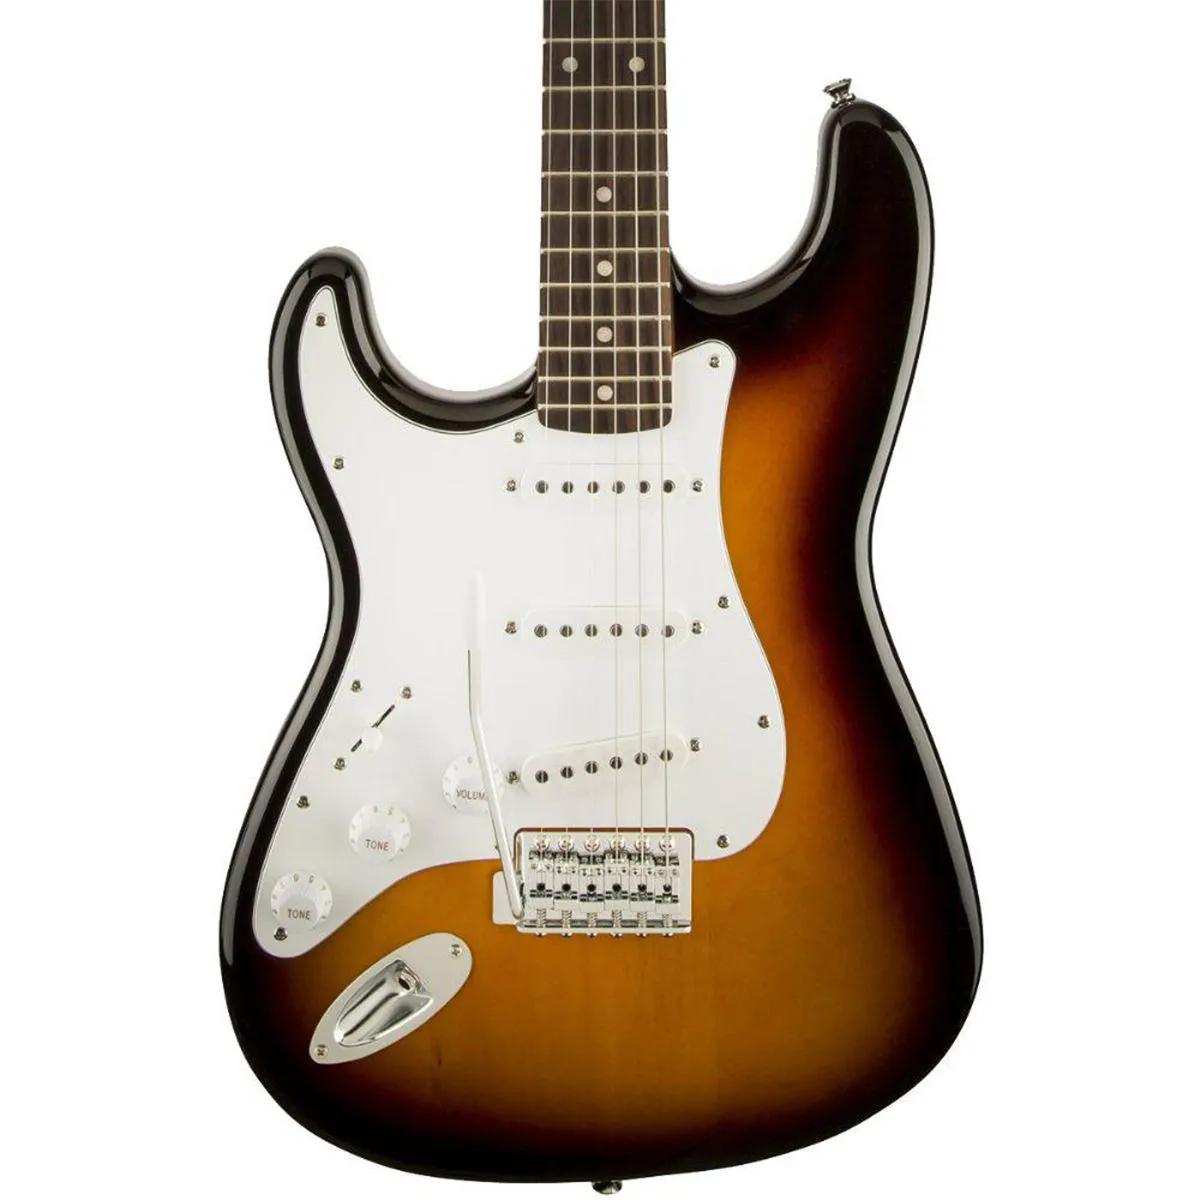 Guitarra Fender Squier Affinity Stratocaster Left Sunburst